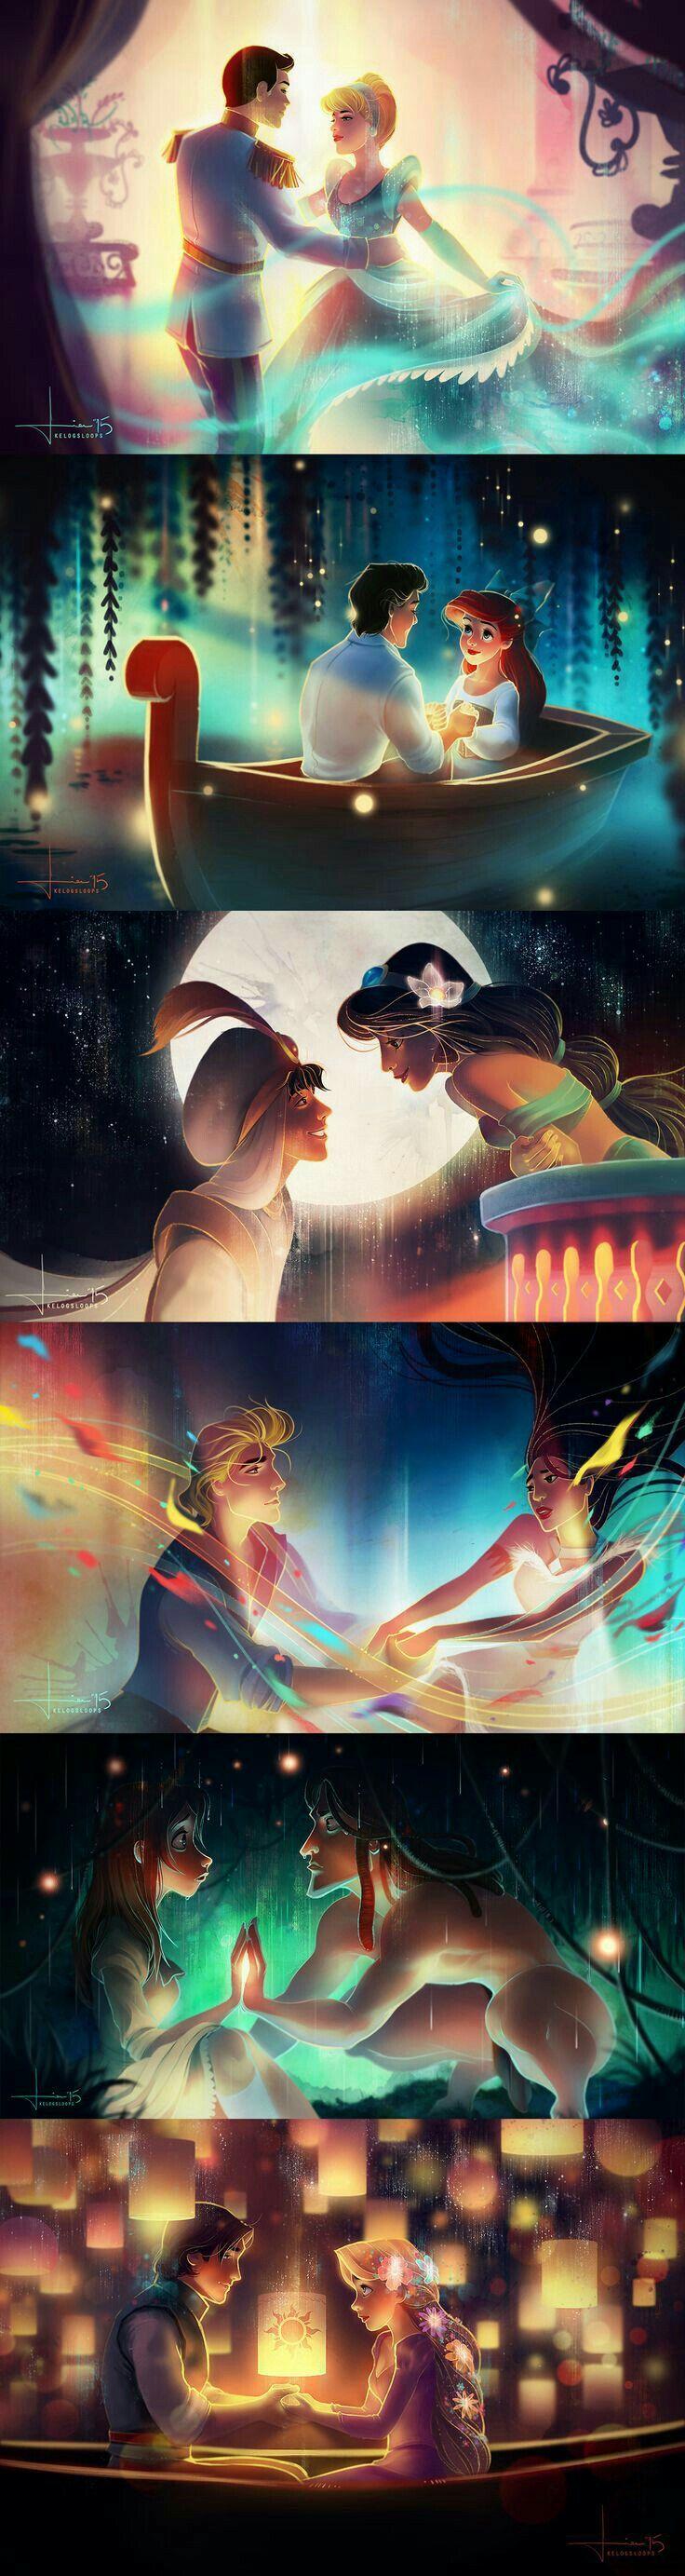 Prince Charming & Princess Cinderella, Prince Eric & Princess Ariel, Aladdin & Princess Jasmine, John Smith & Pocahontas, Tarzan & Jane, Eugene & Rapunzel